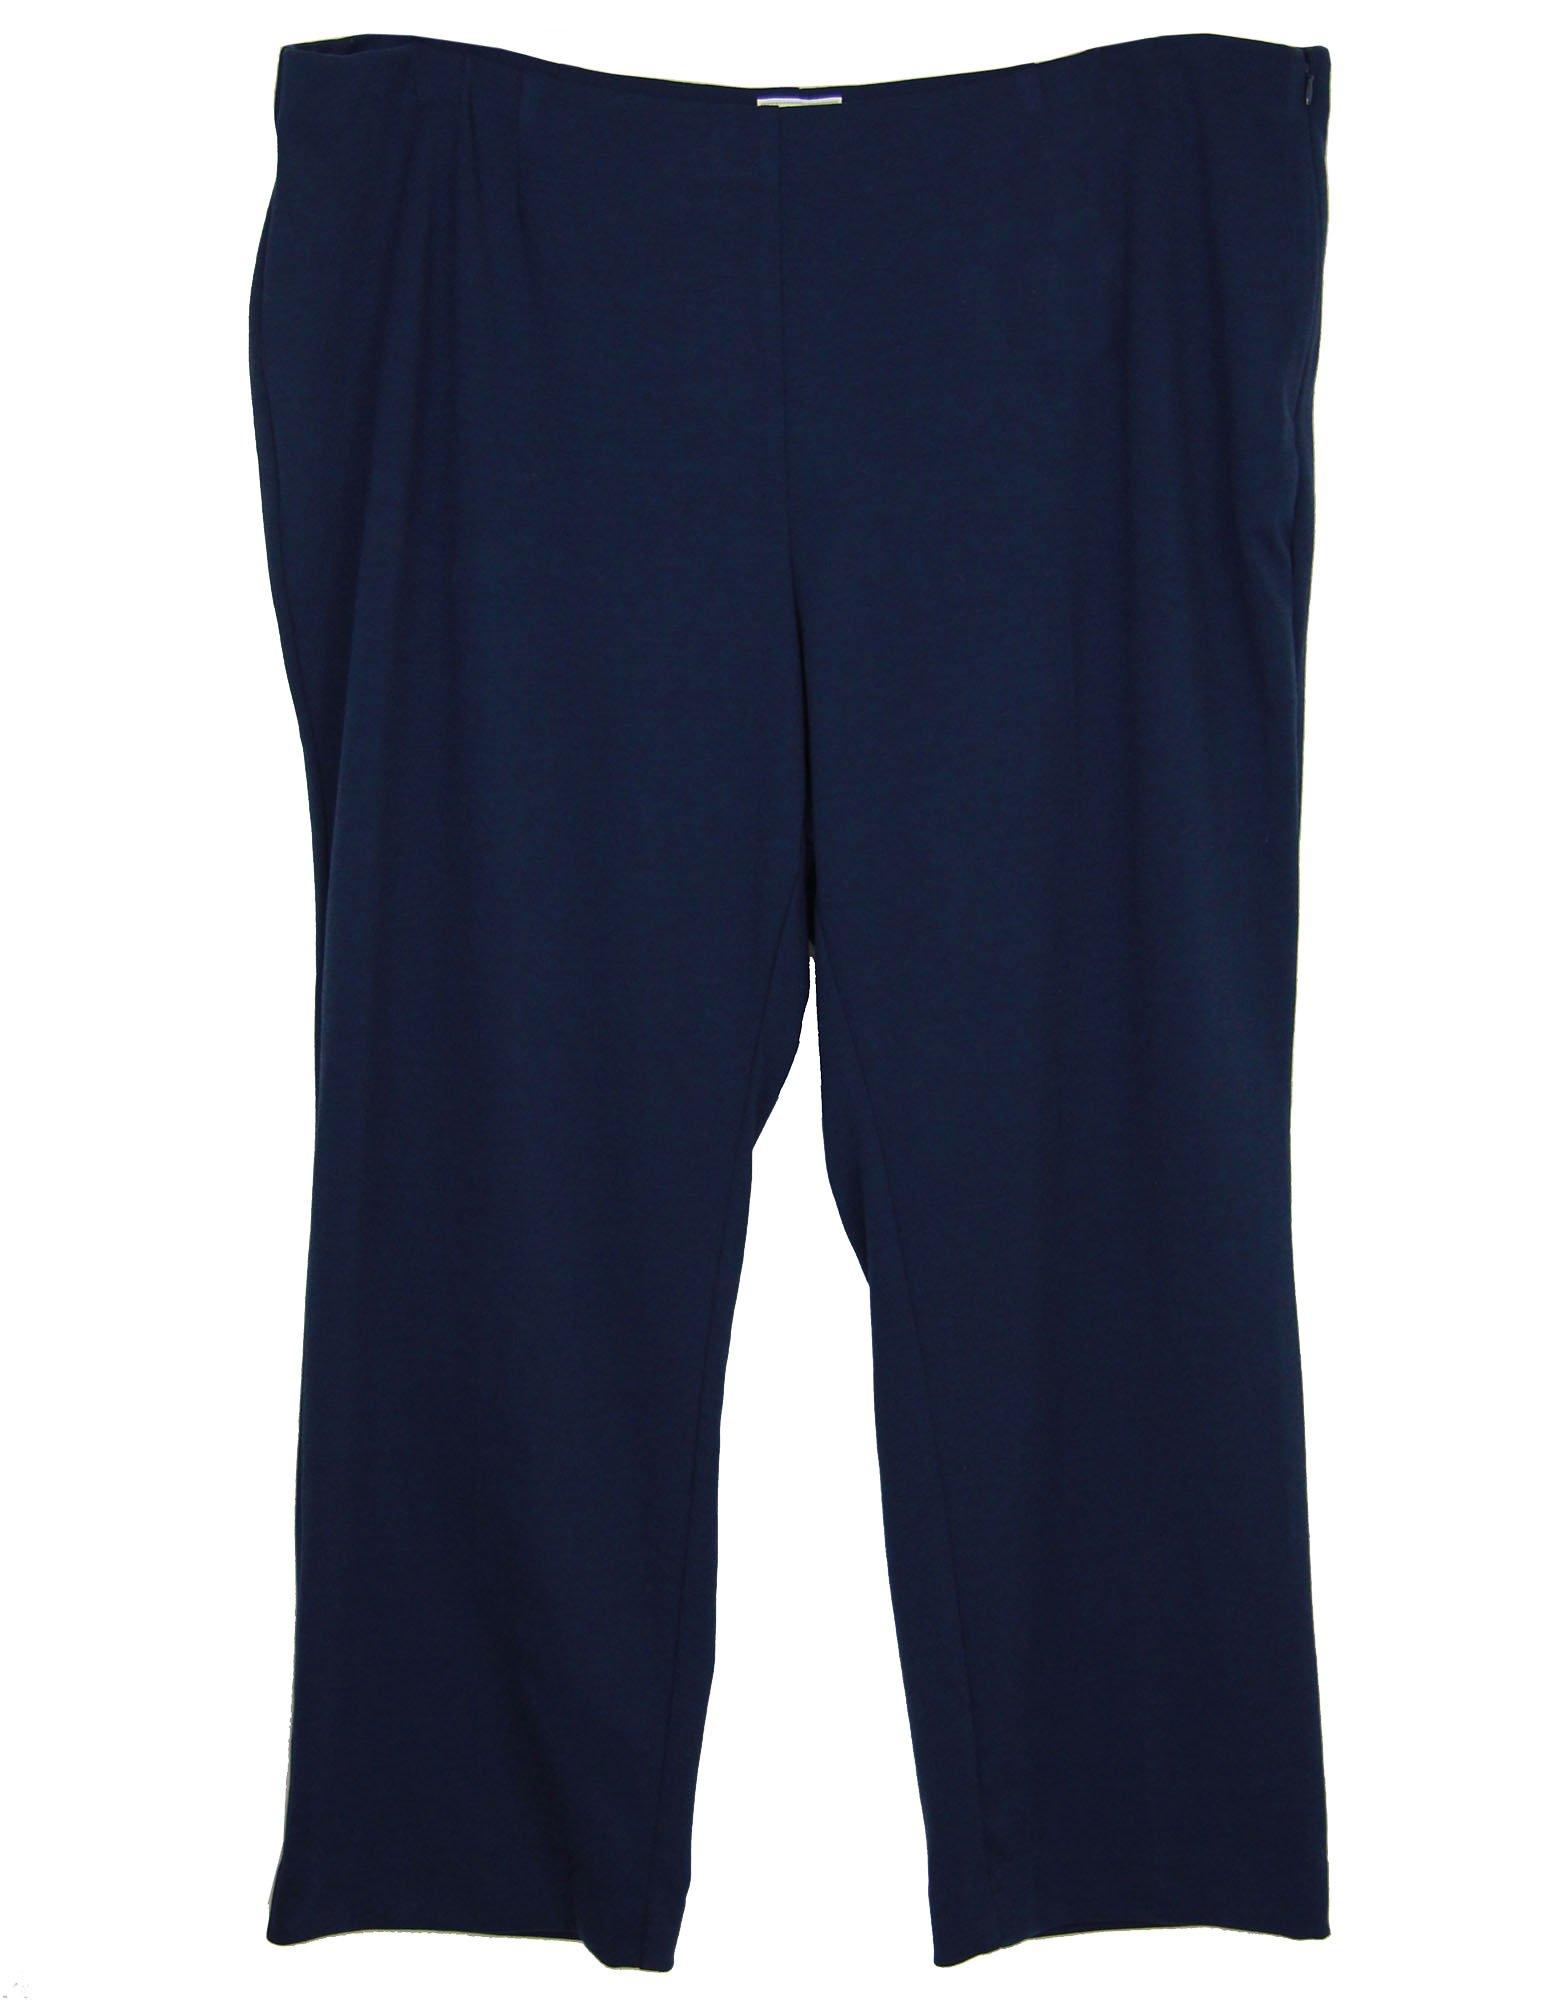 Charter Club Women's Plus Side Zip Straight Leg Pants 24w Intrepid Blue